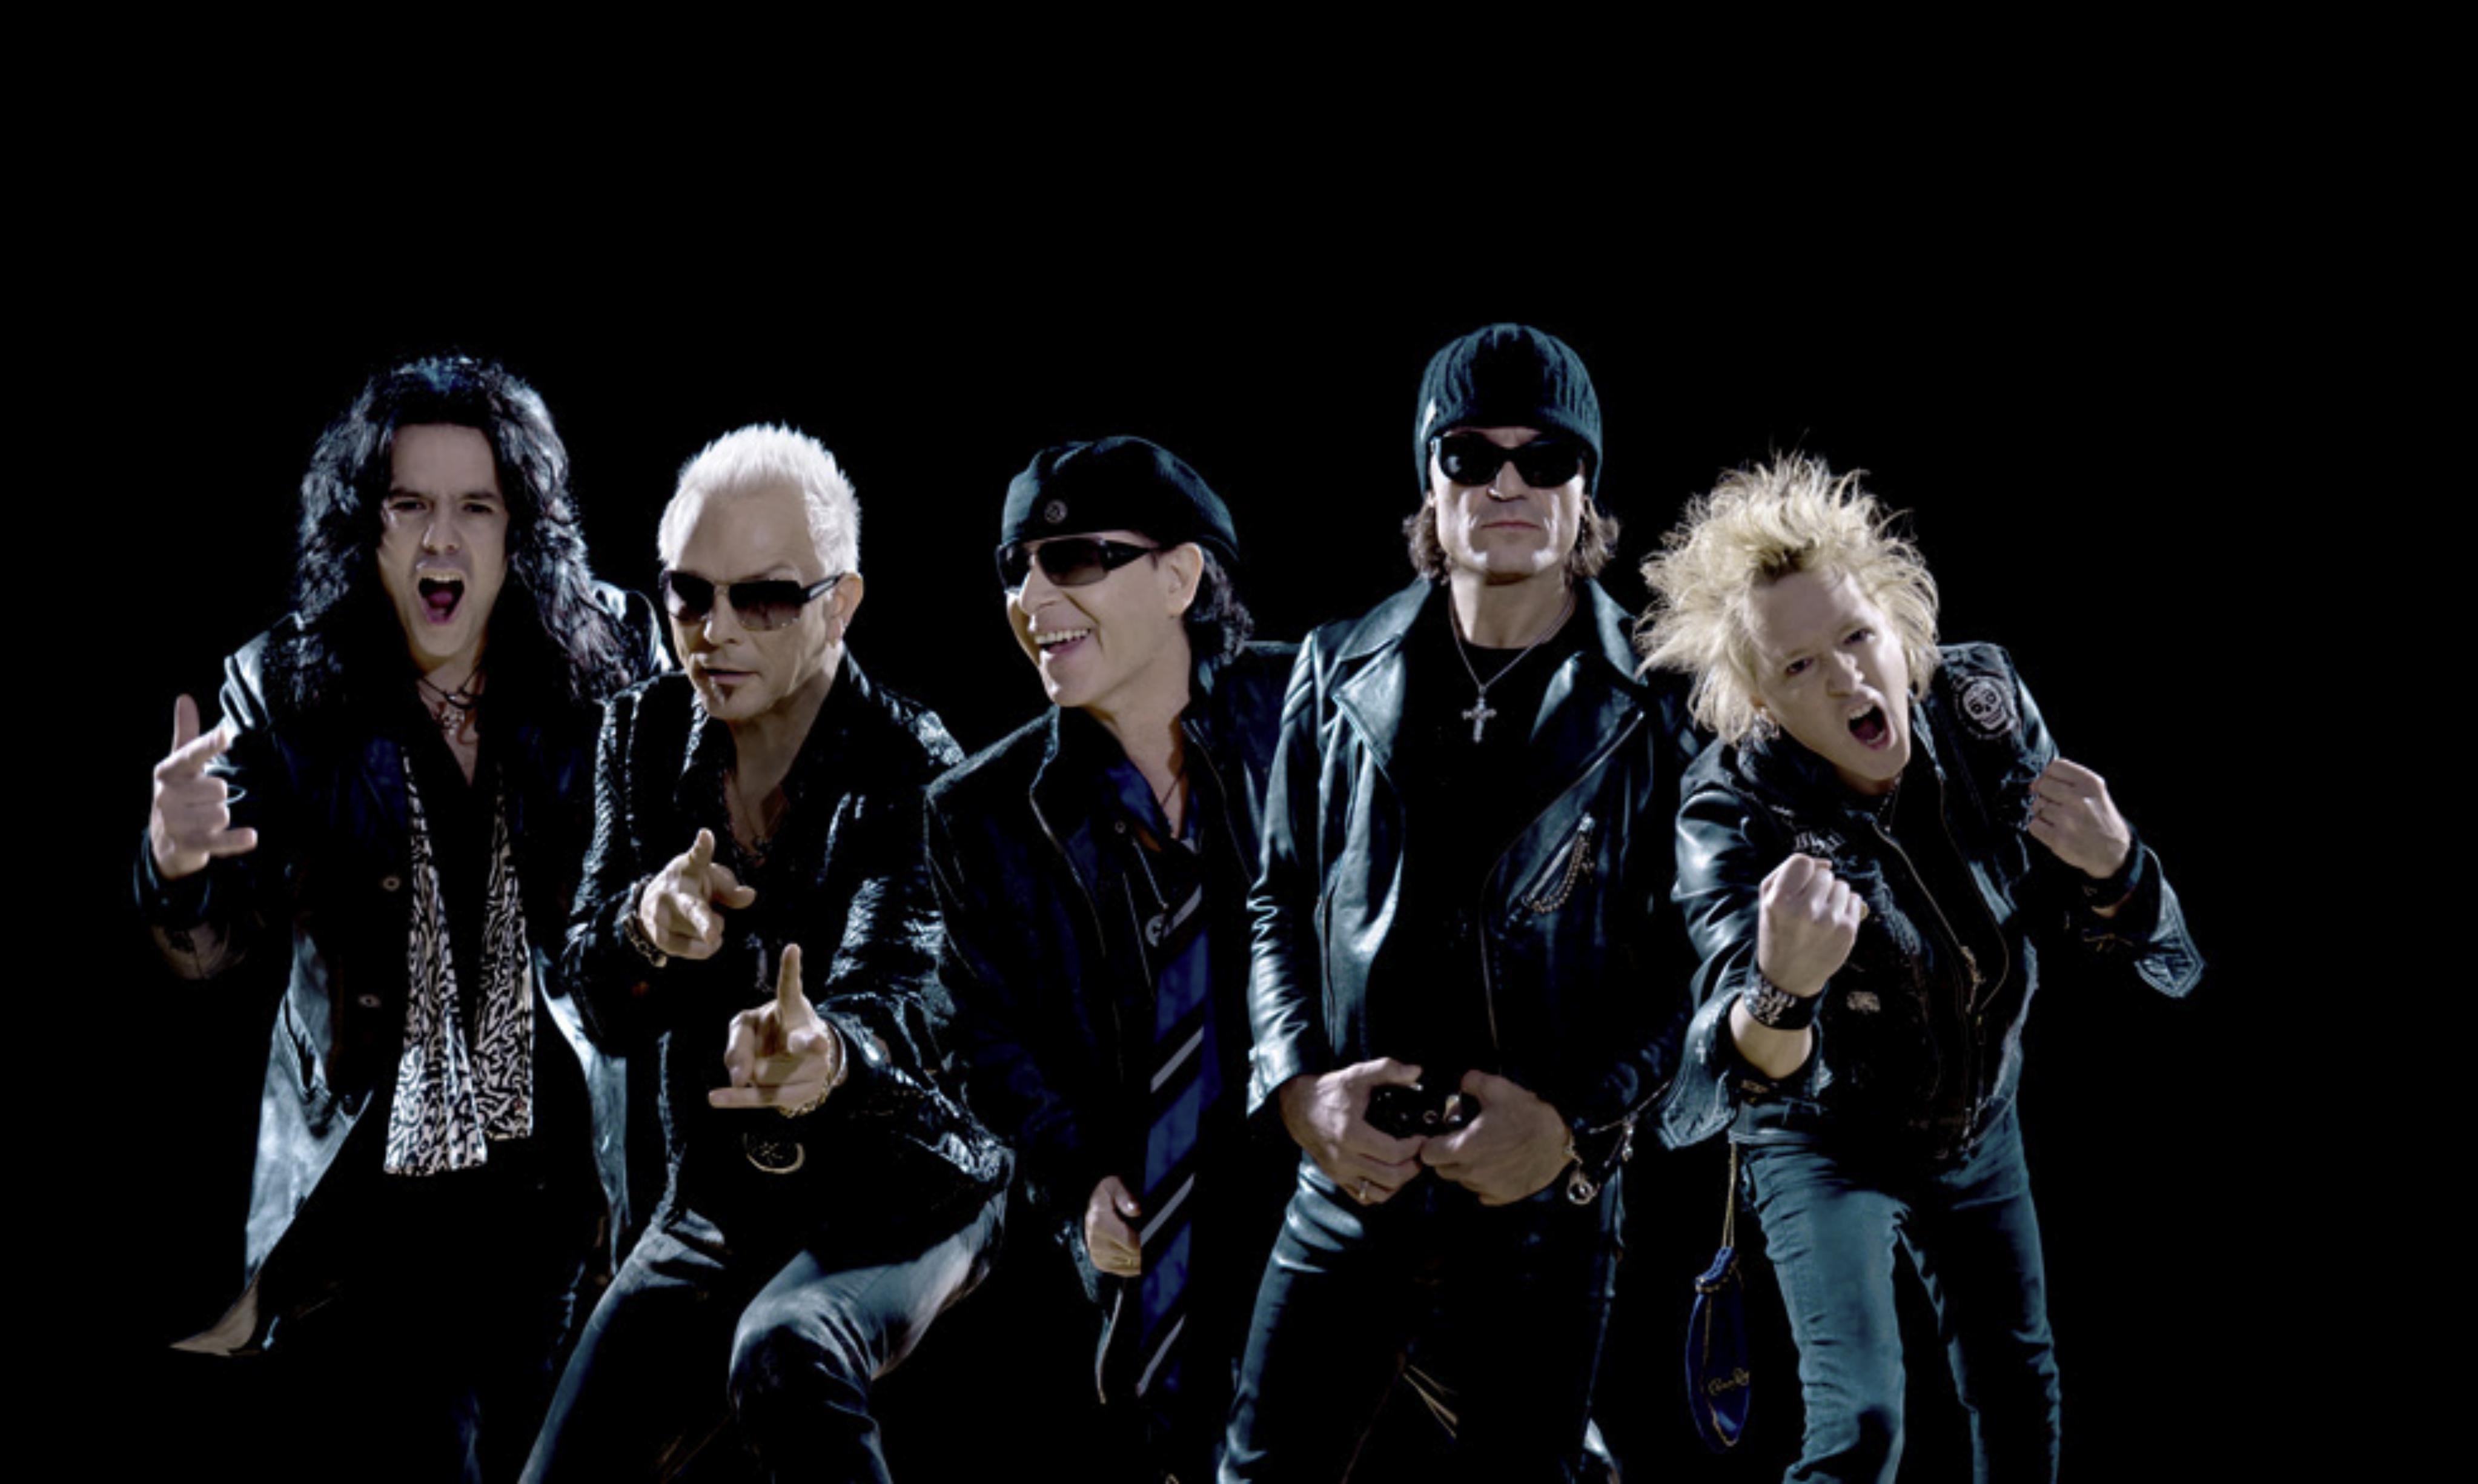 The animals band logo scorpions band logo - Scorpions Band Guns N Roses Wallpapers